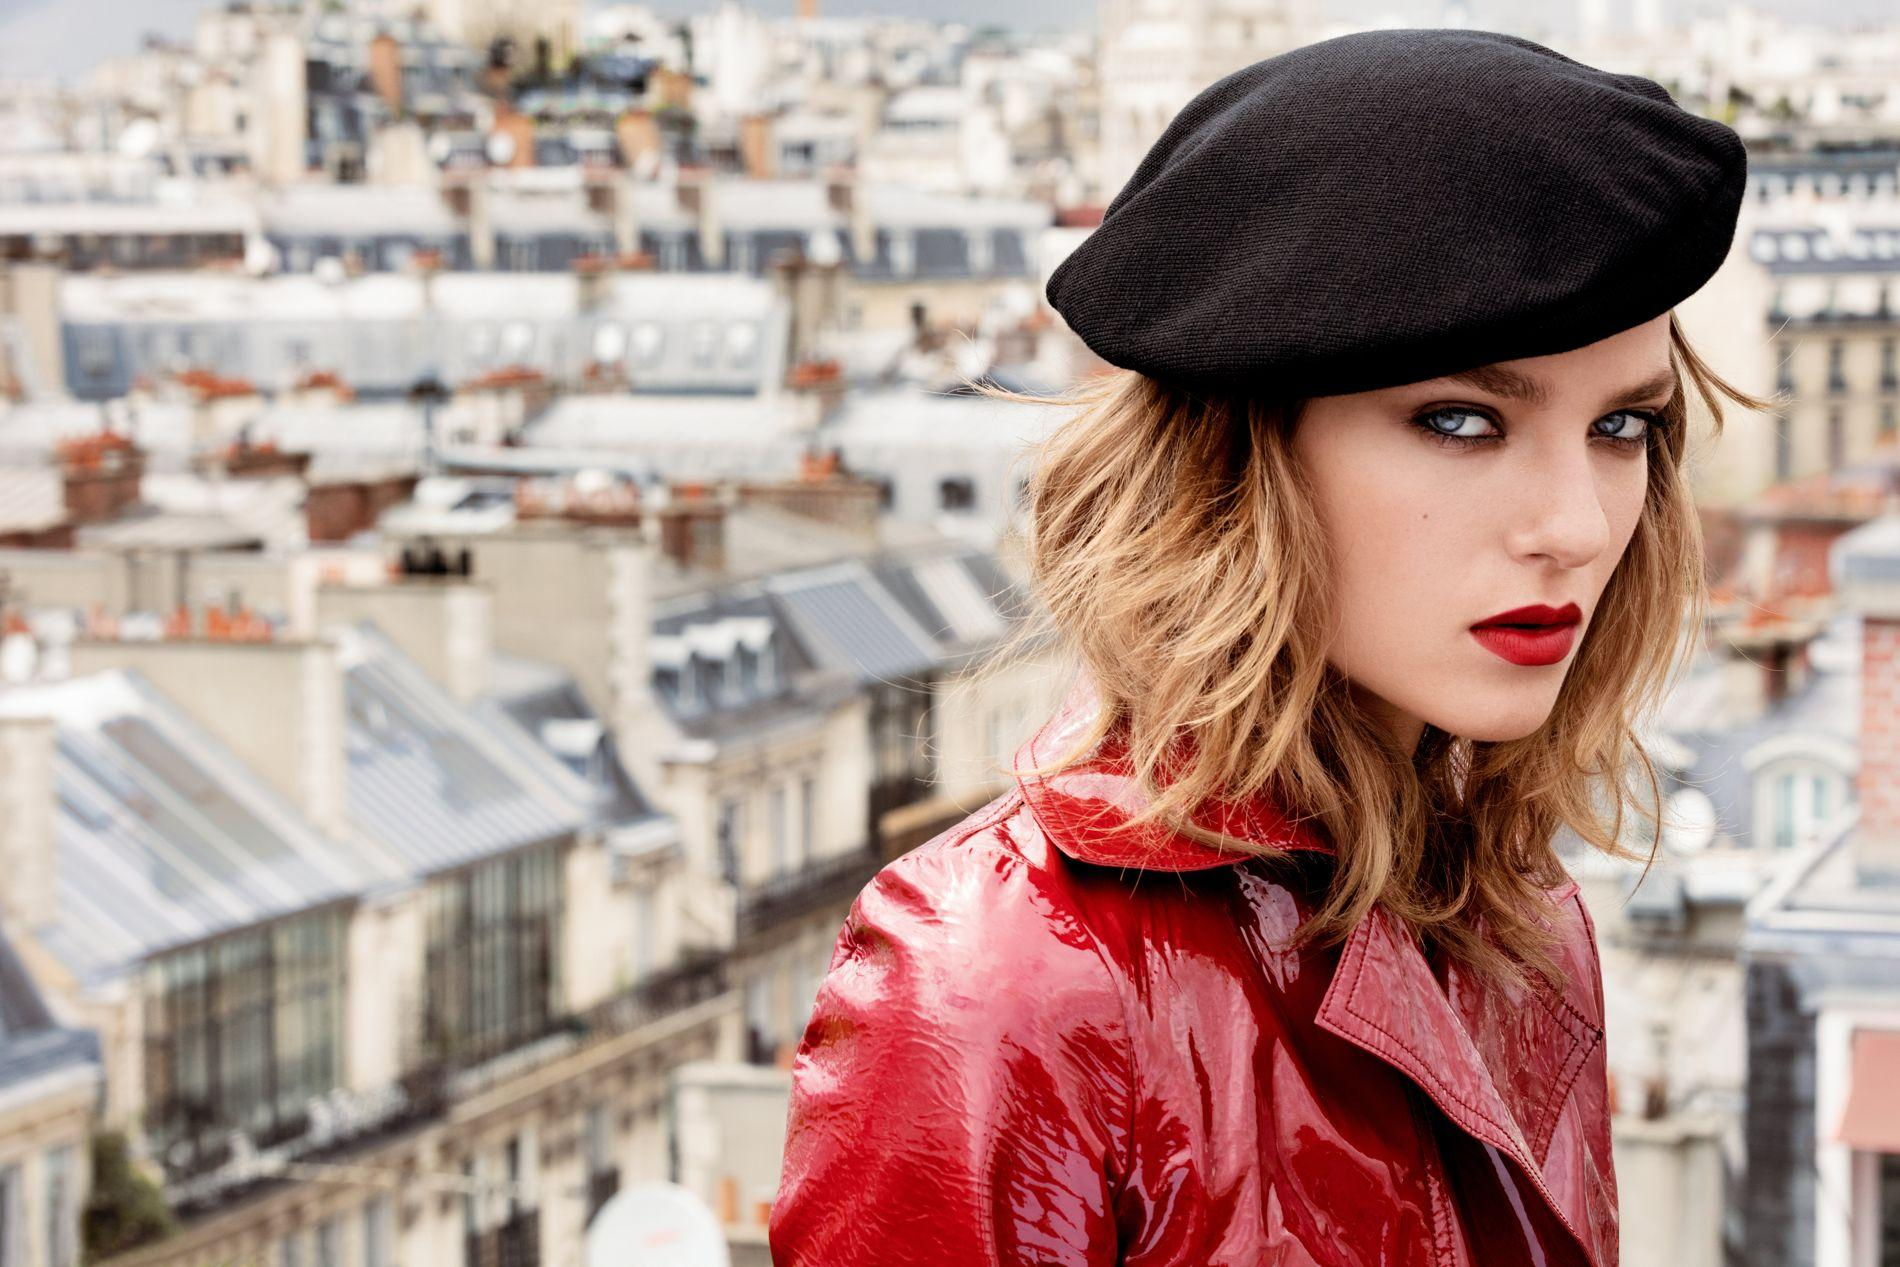 француженки и парижанки фото многих моделях имеется